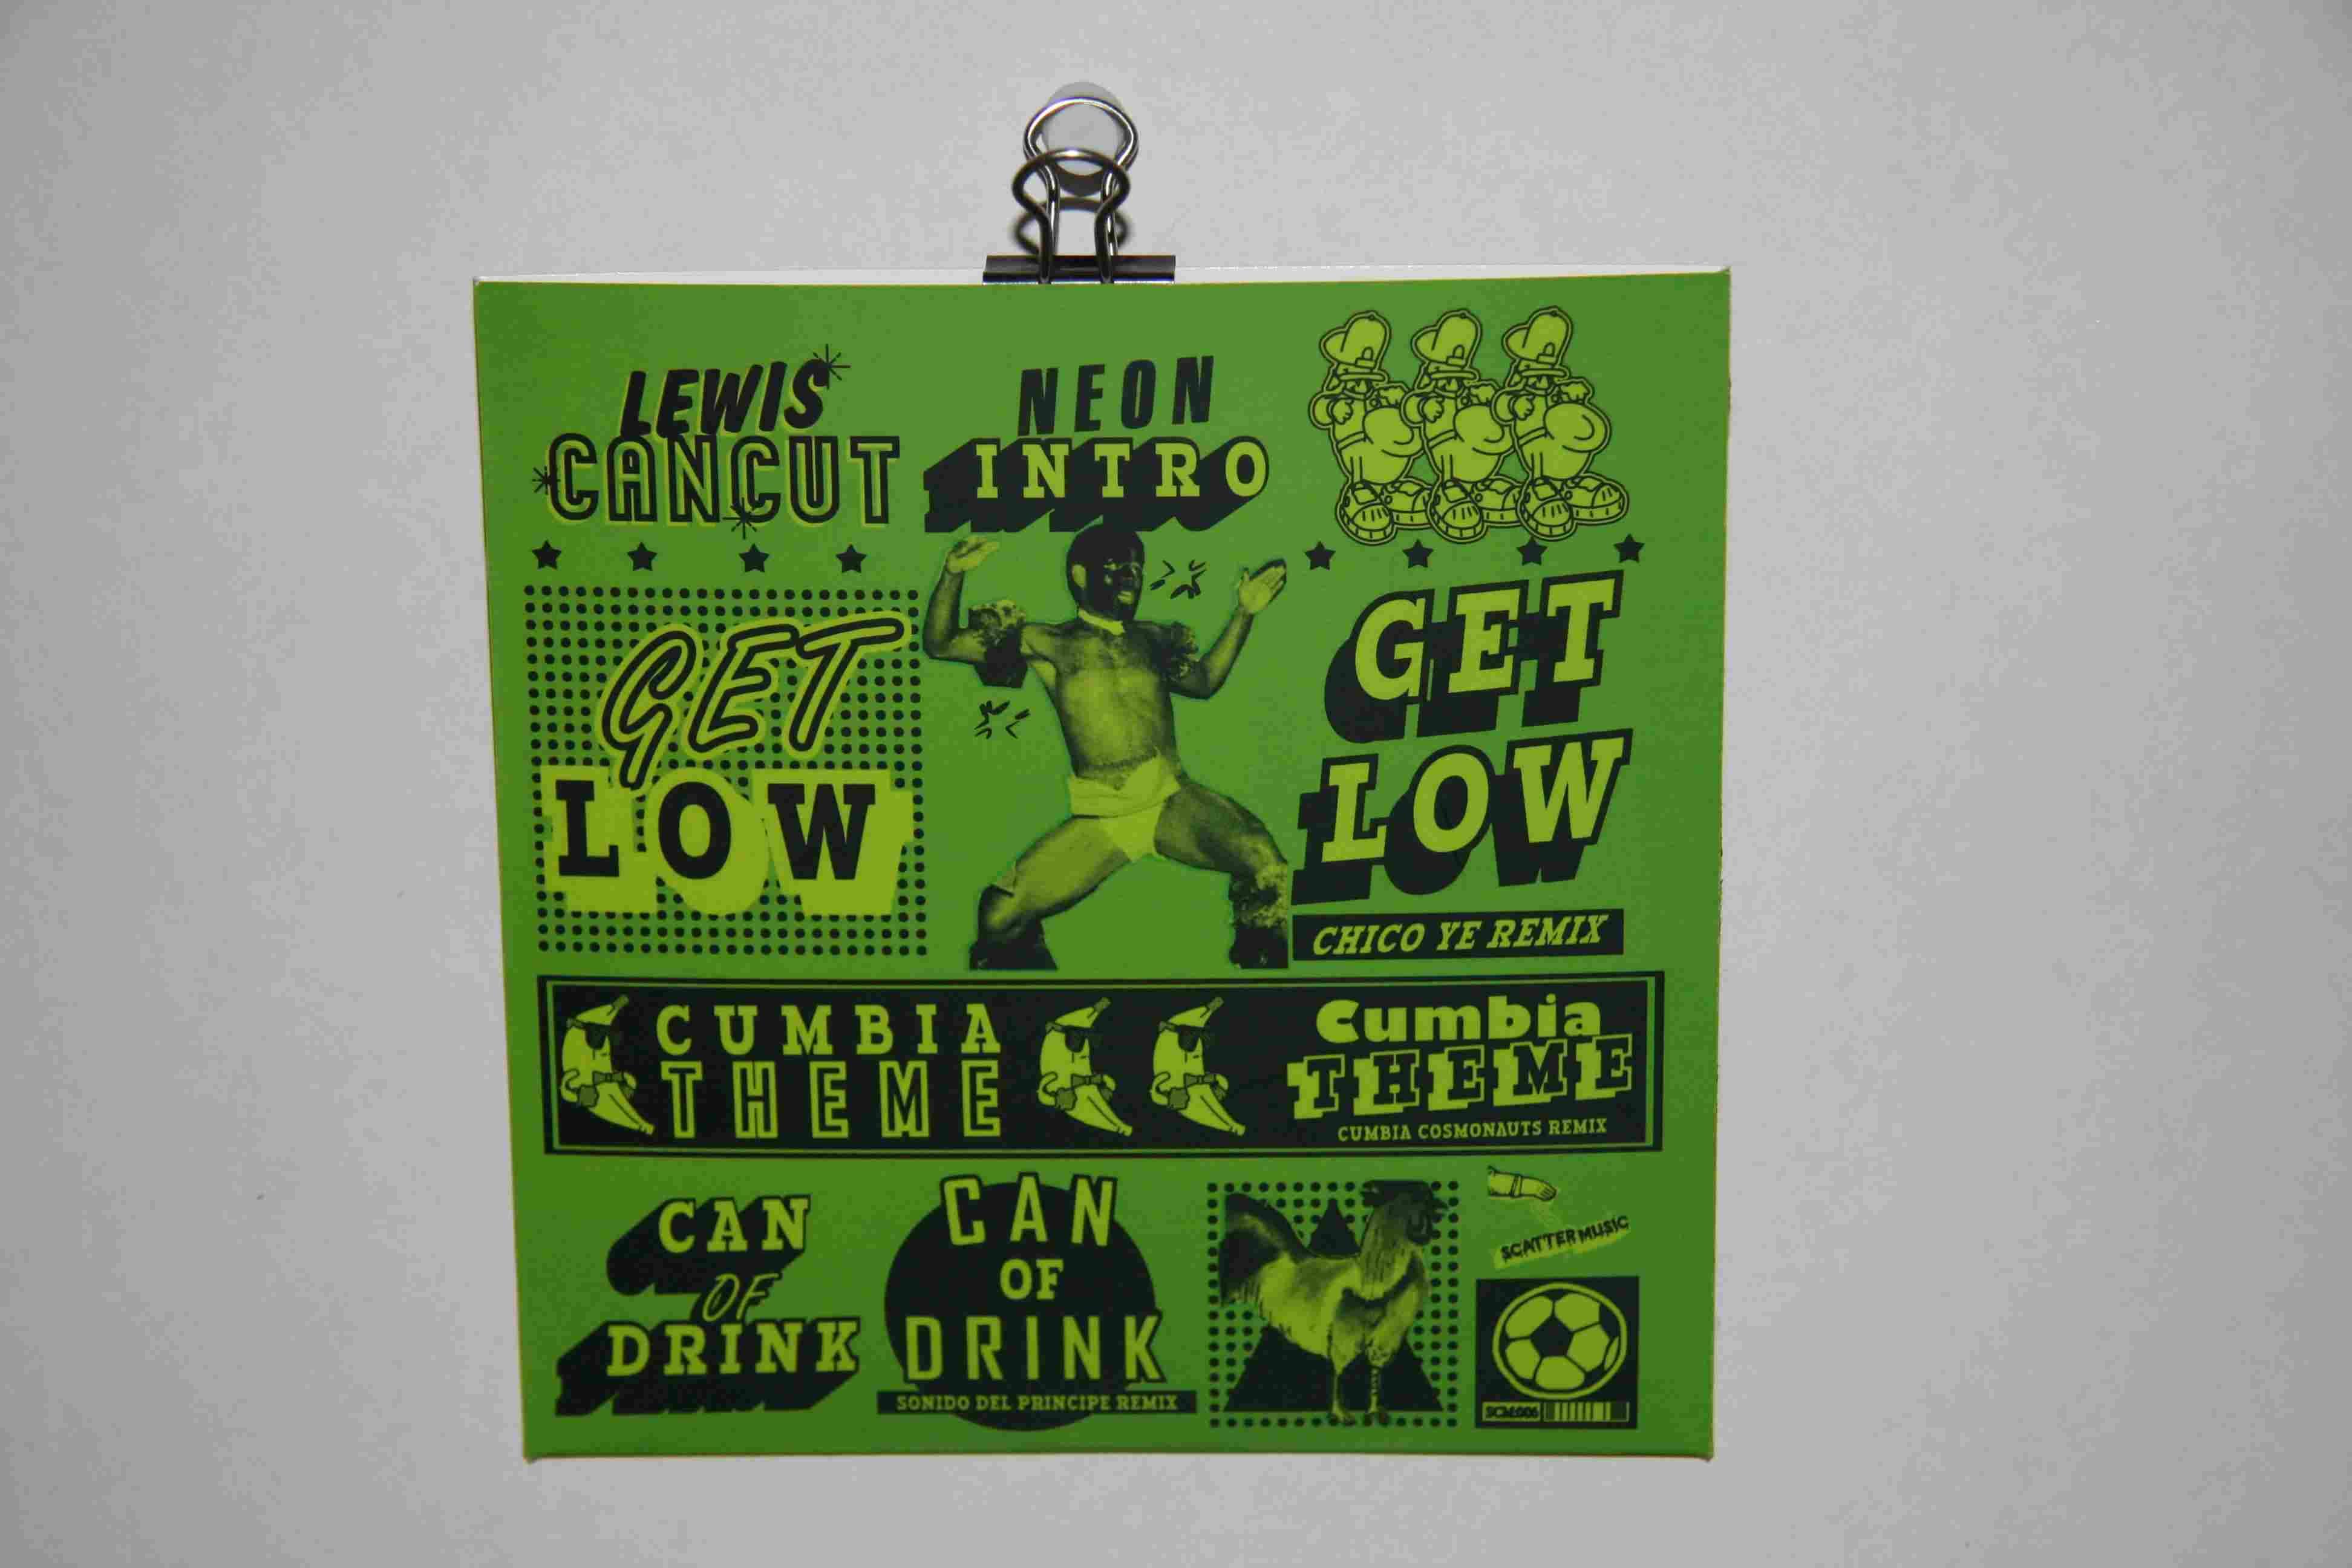 Lewis CanCut - Neon Saxophone - CD Back